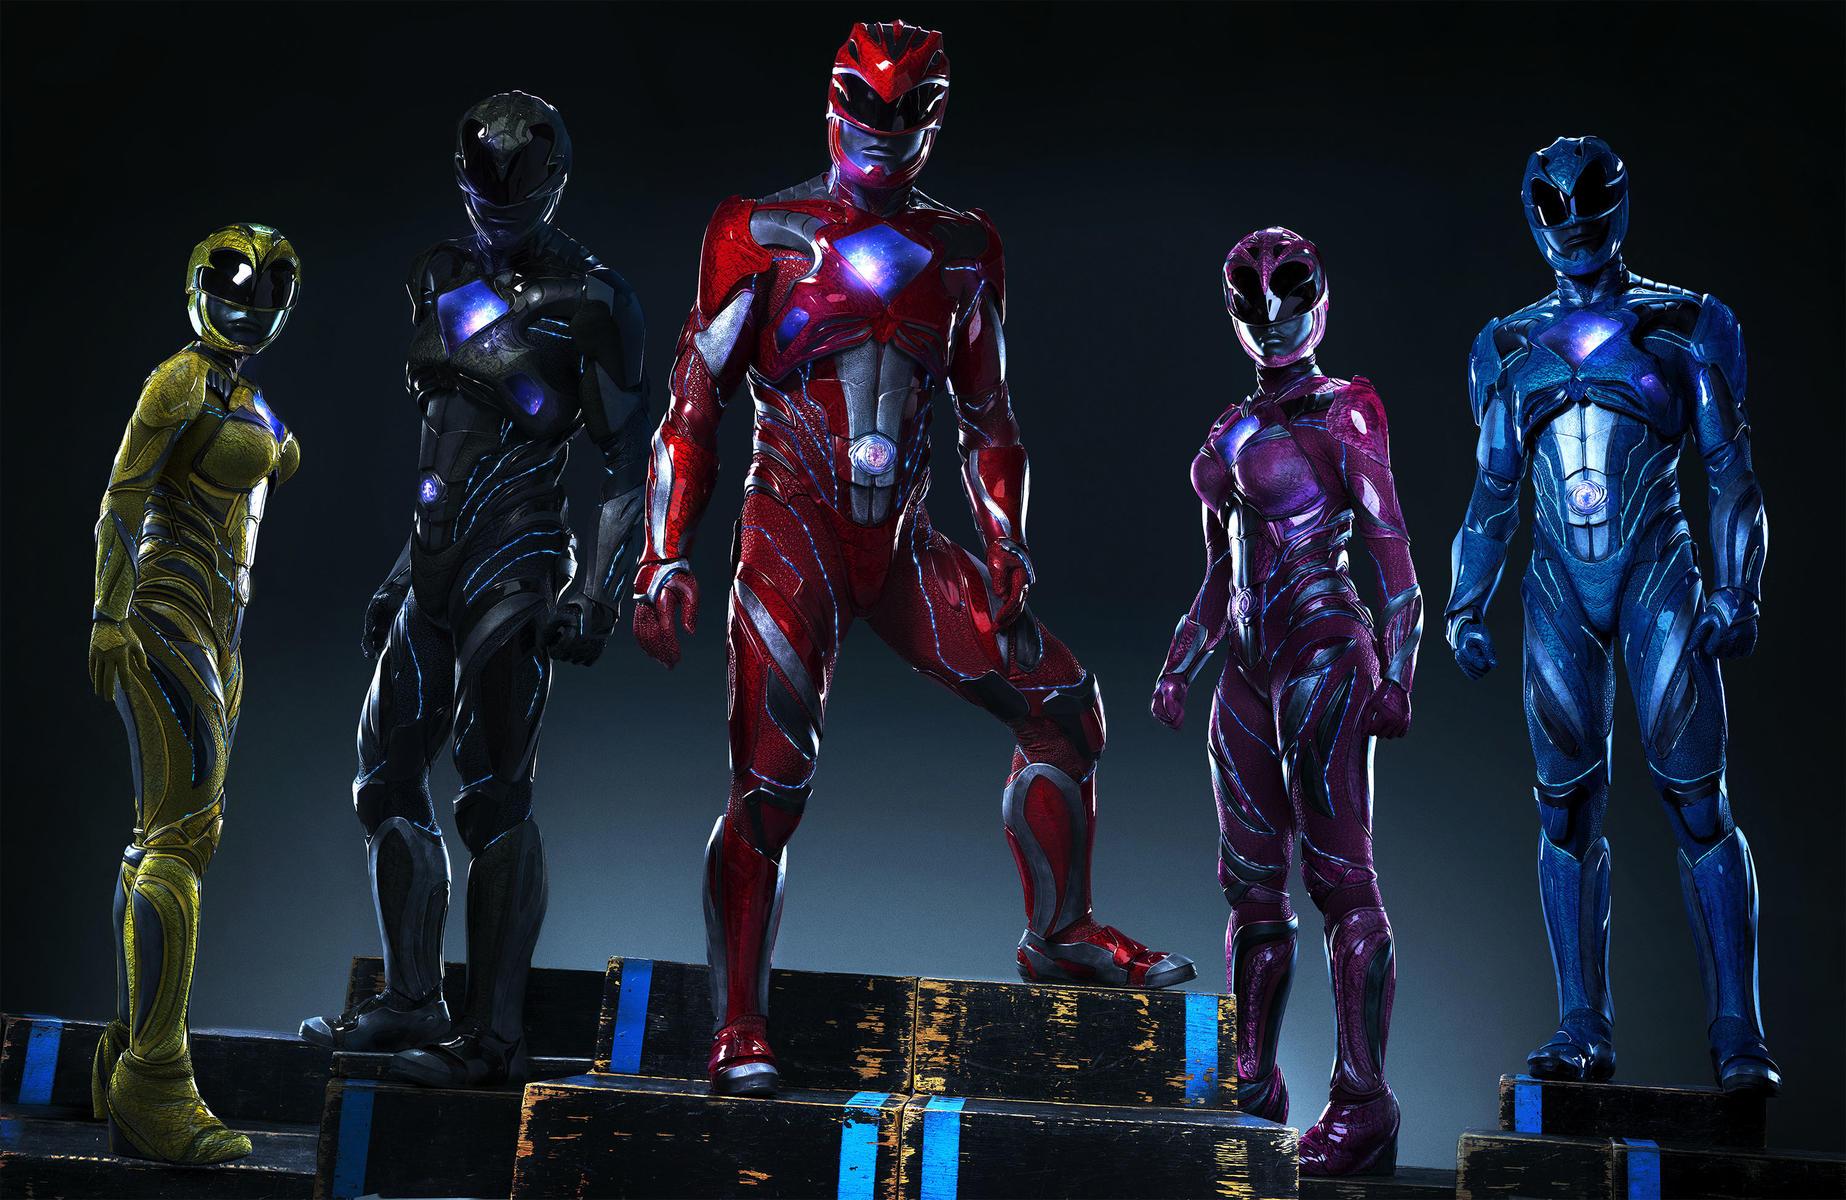 Power Rangers Kritik zum Film Superhelden